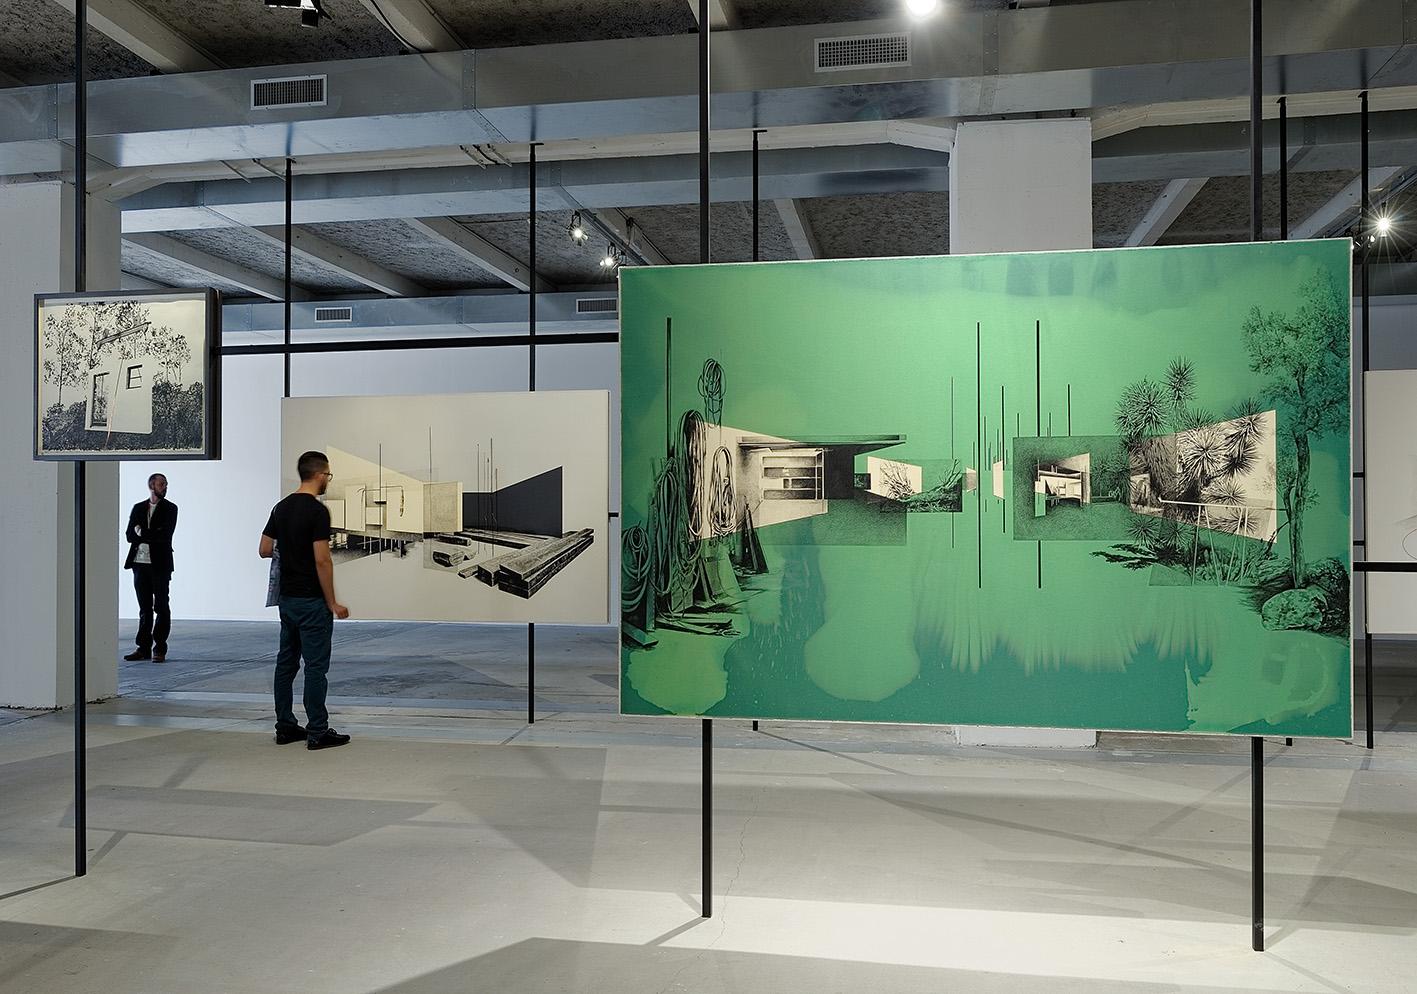 Tatiana Trouvé, Senza Titolo, Courtesy: La Biennale de Lyon. Photo: © Blaise Adilon.